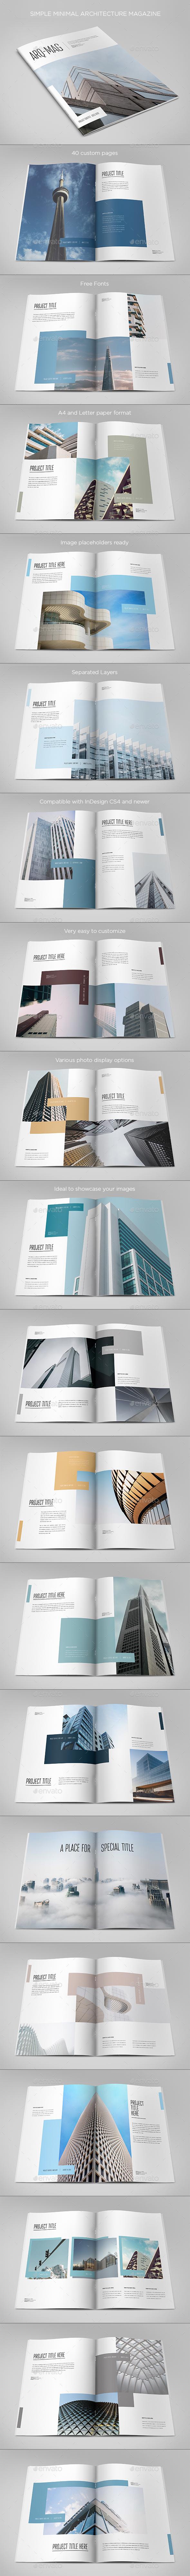 Simple Minimal Architecture Magazine - Magazines Print Templates